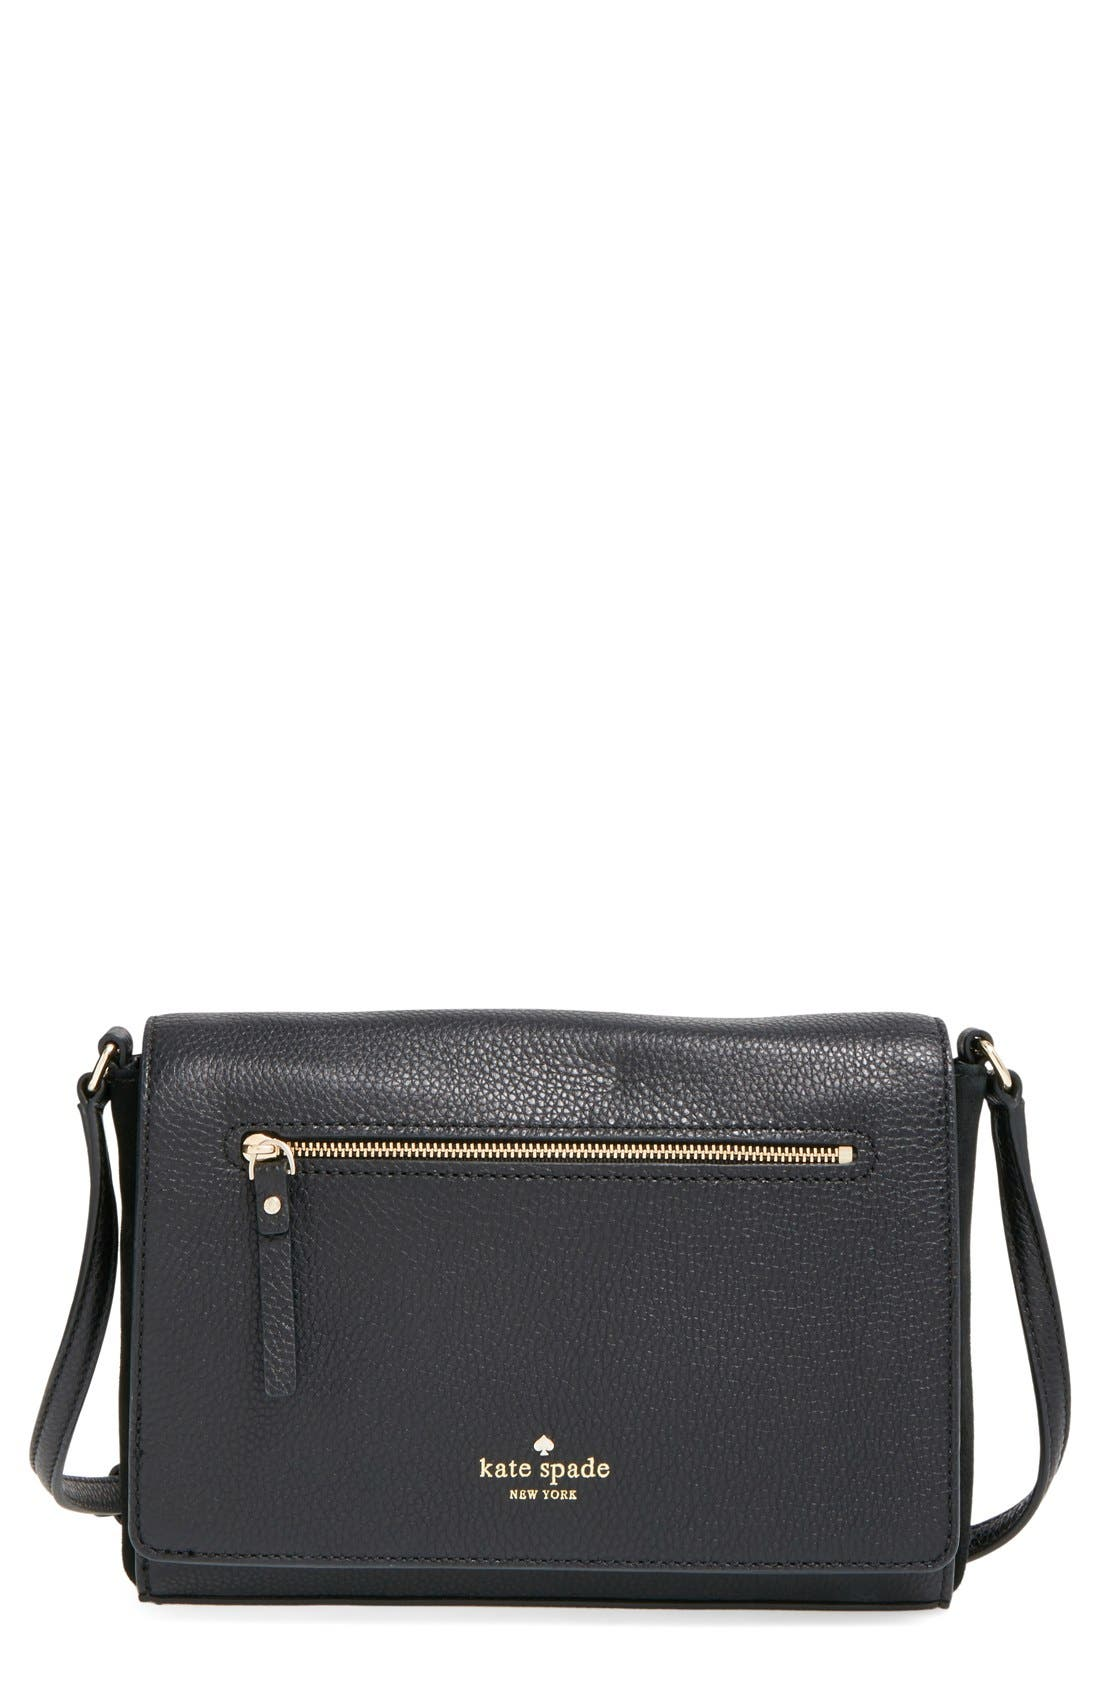 Main Image - kate spade new york 'matthews drive - patty' leather & suede crossbody bag